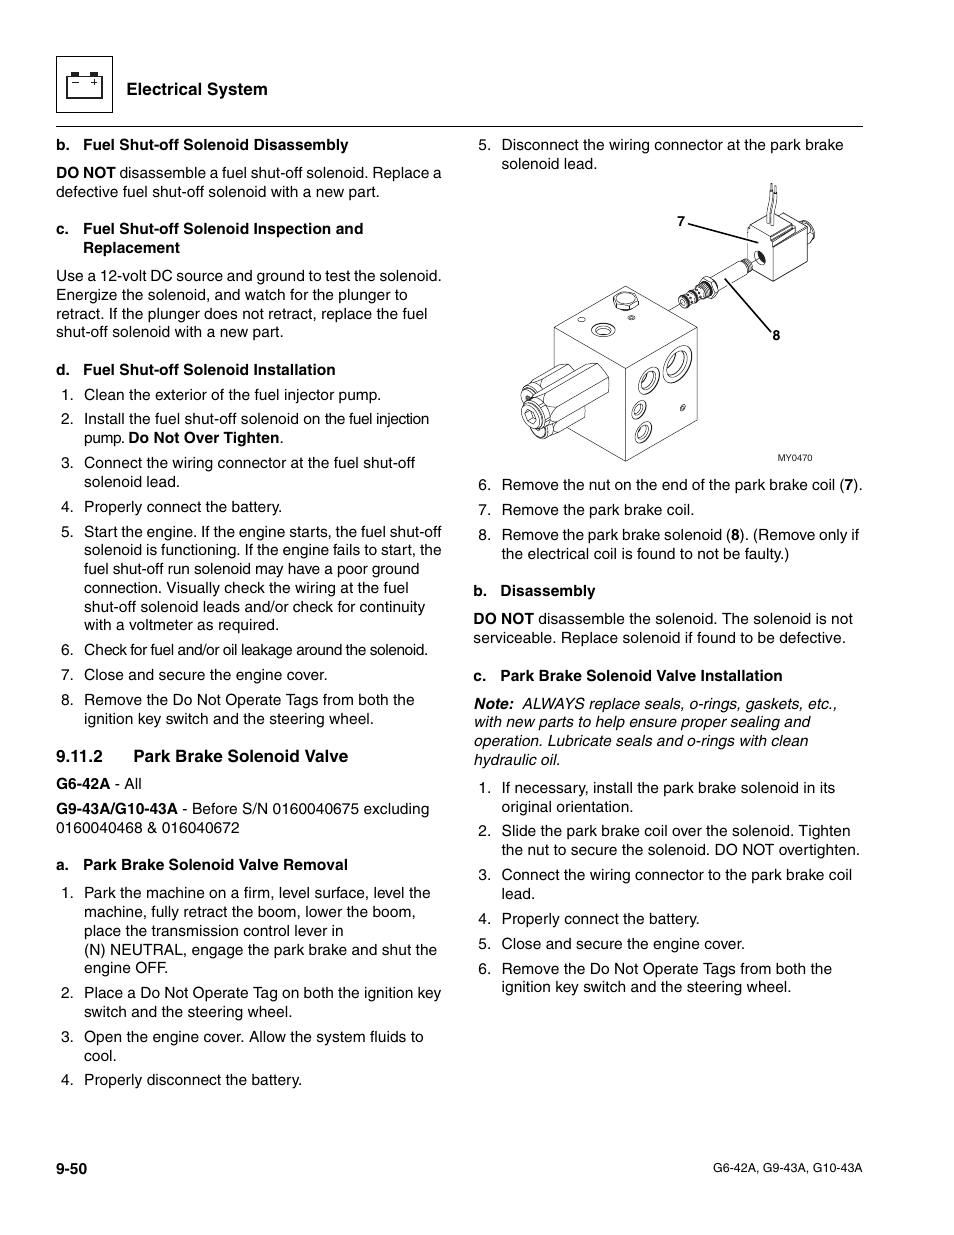 Jlg G6 42a Wiring Diagram Manual E Books 450 Schematics Detailed